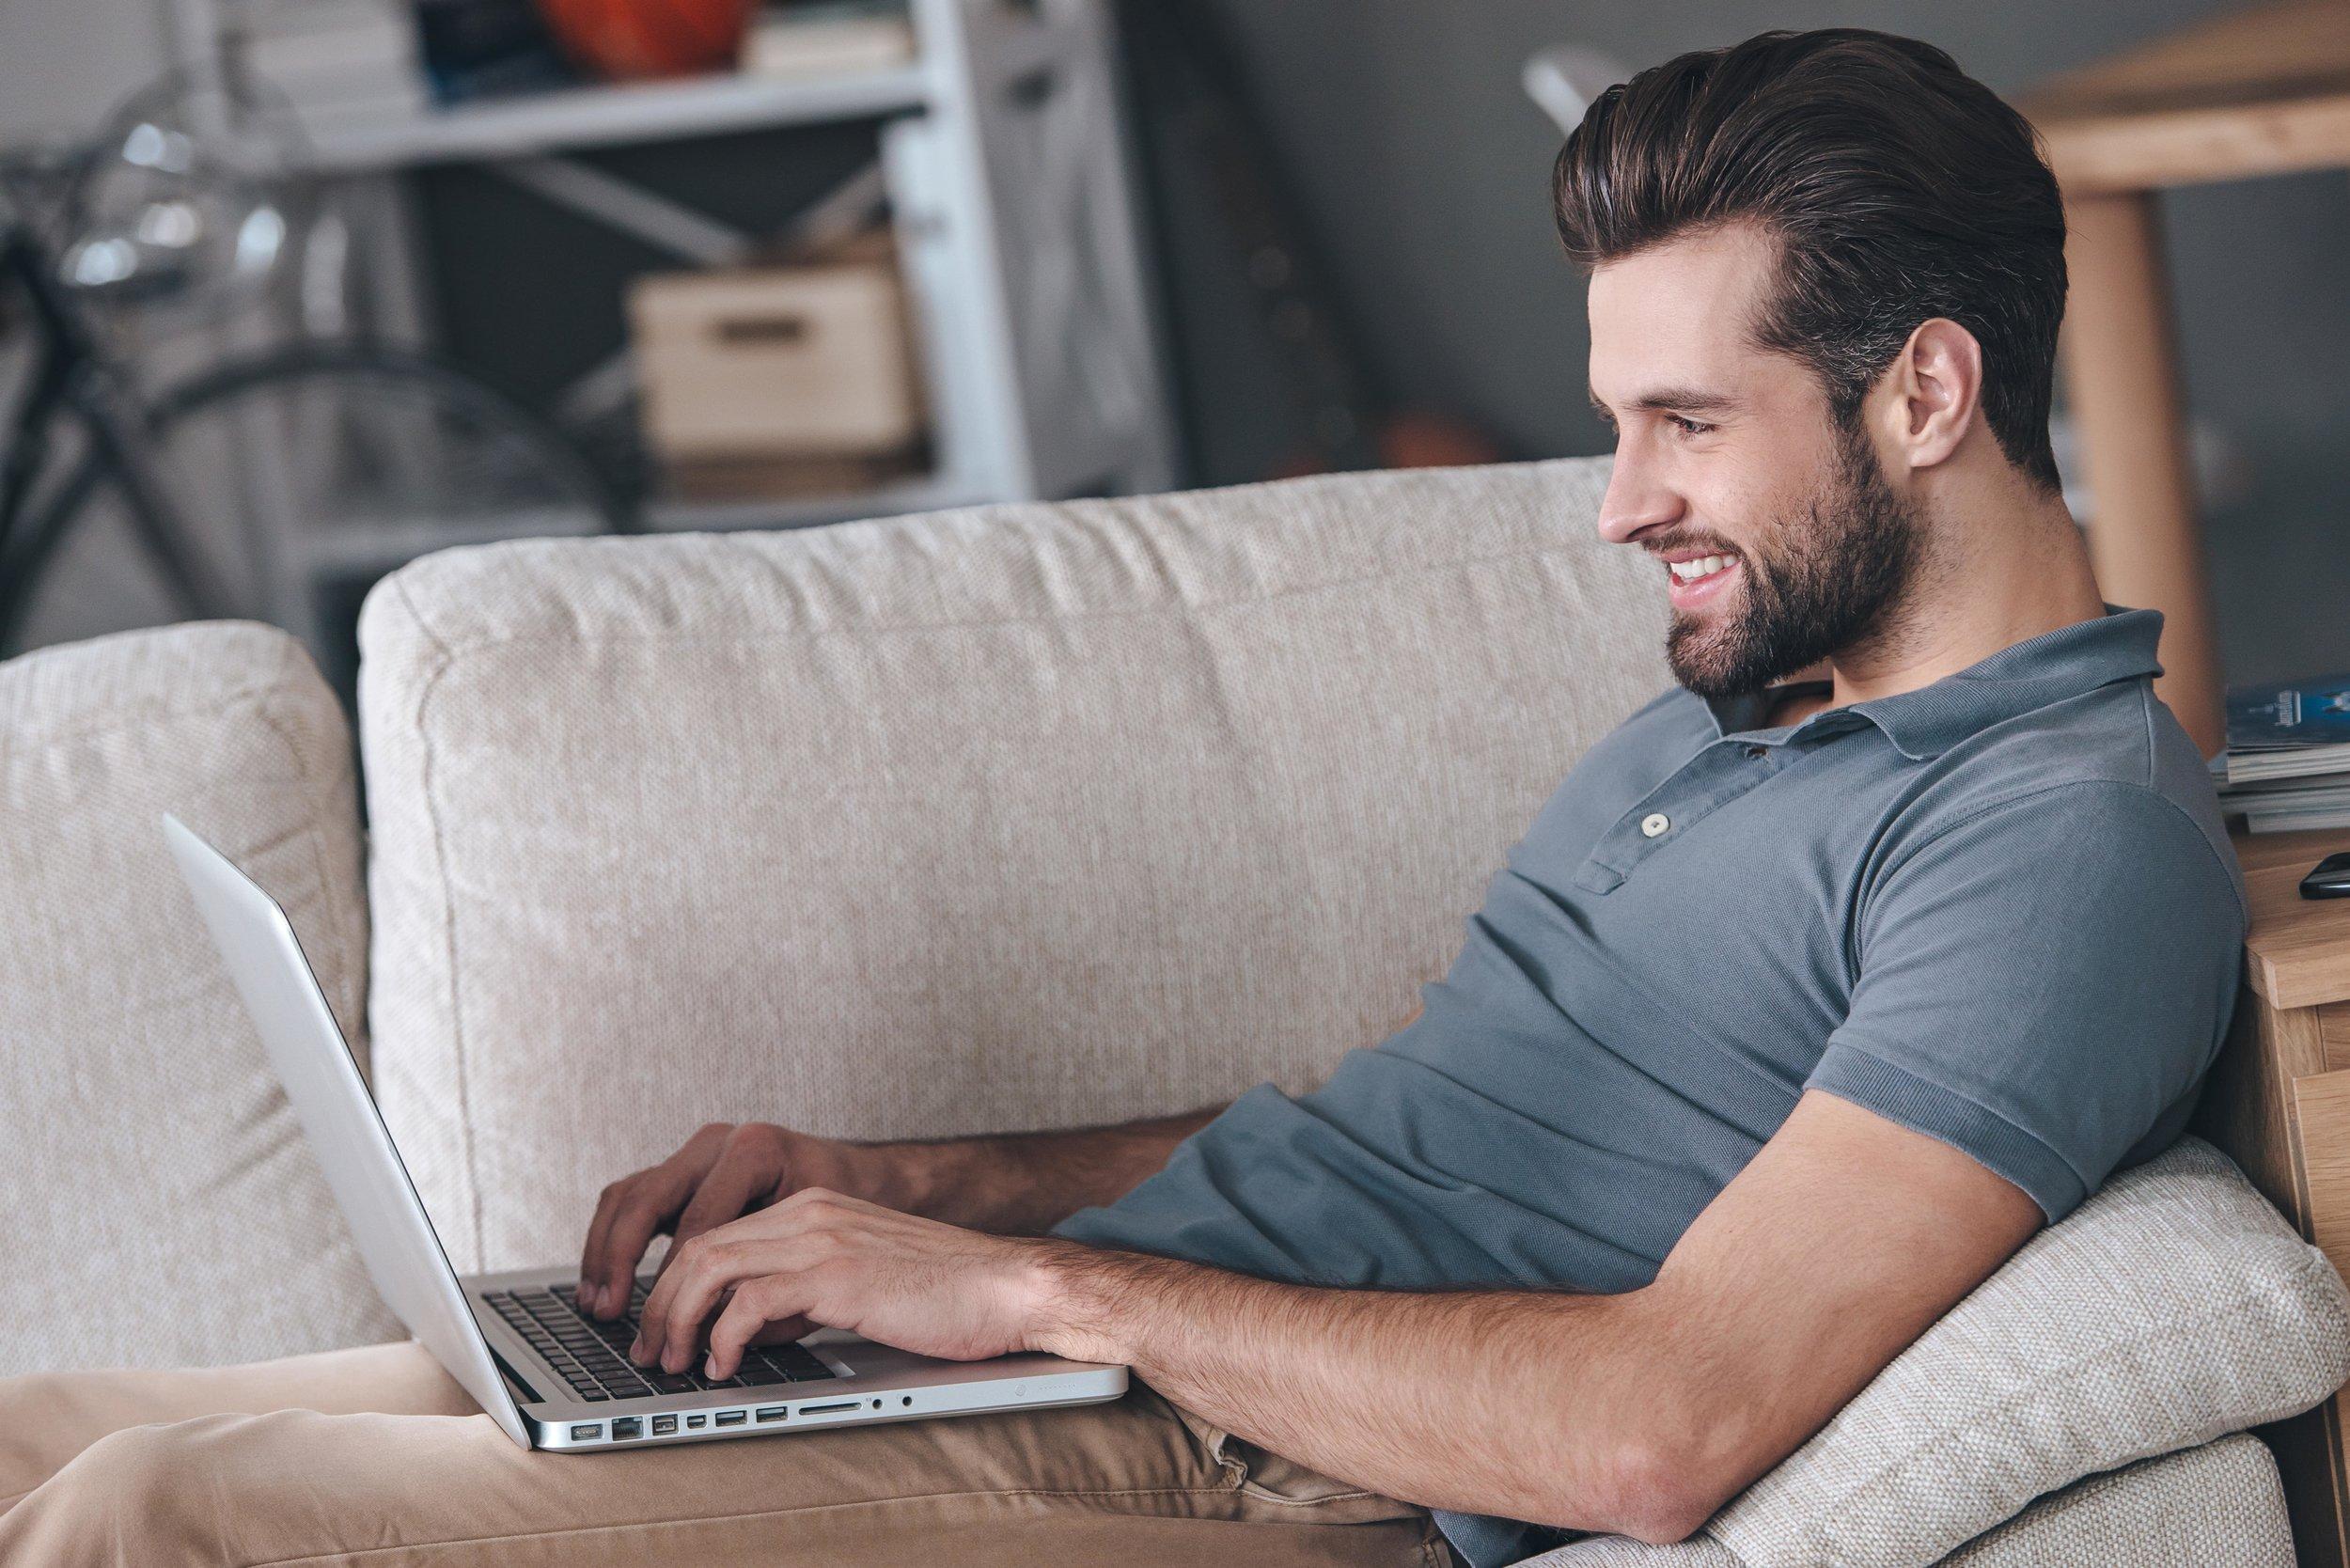 Man on sofa on laptop video chat-min.jpg